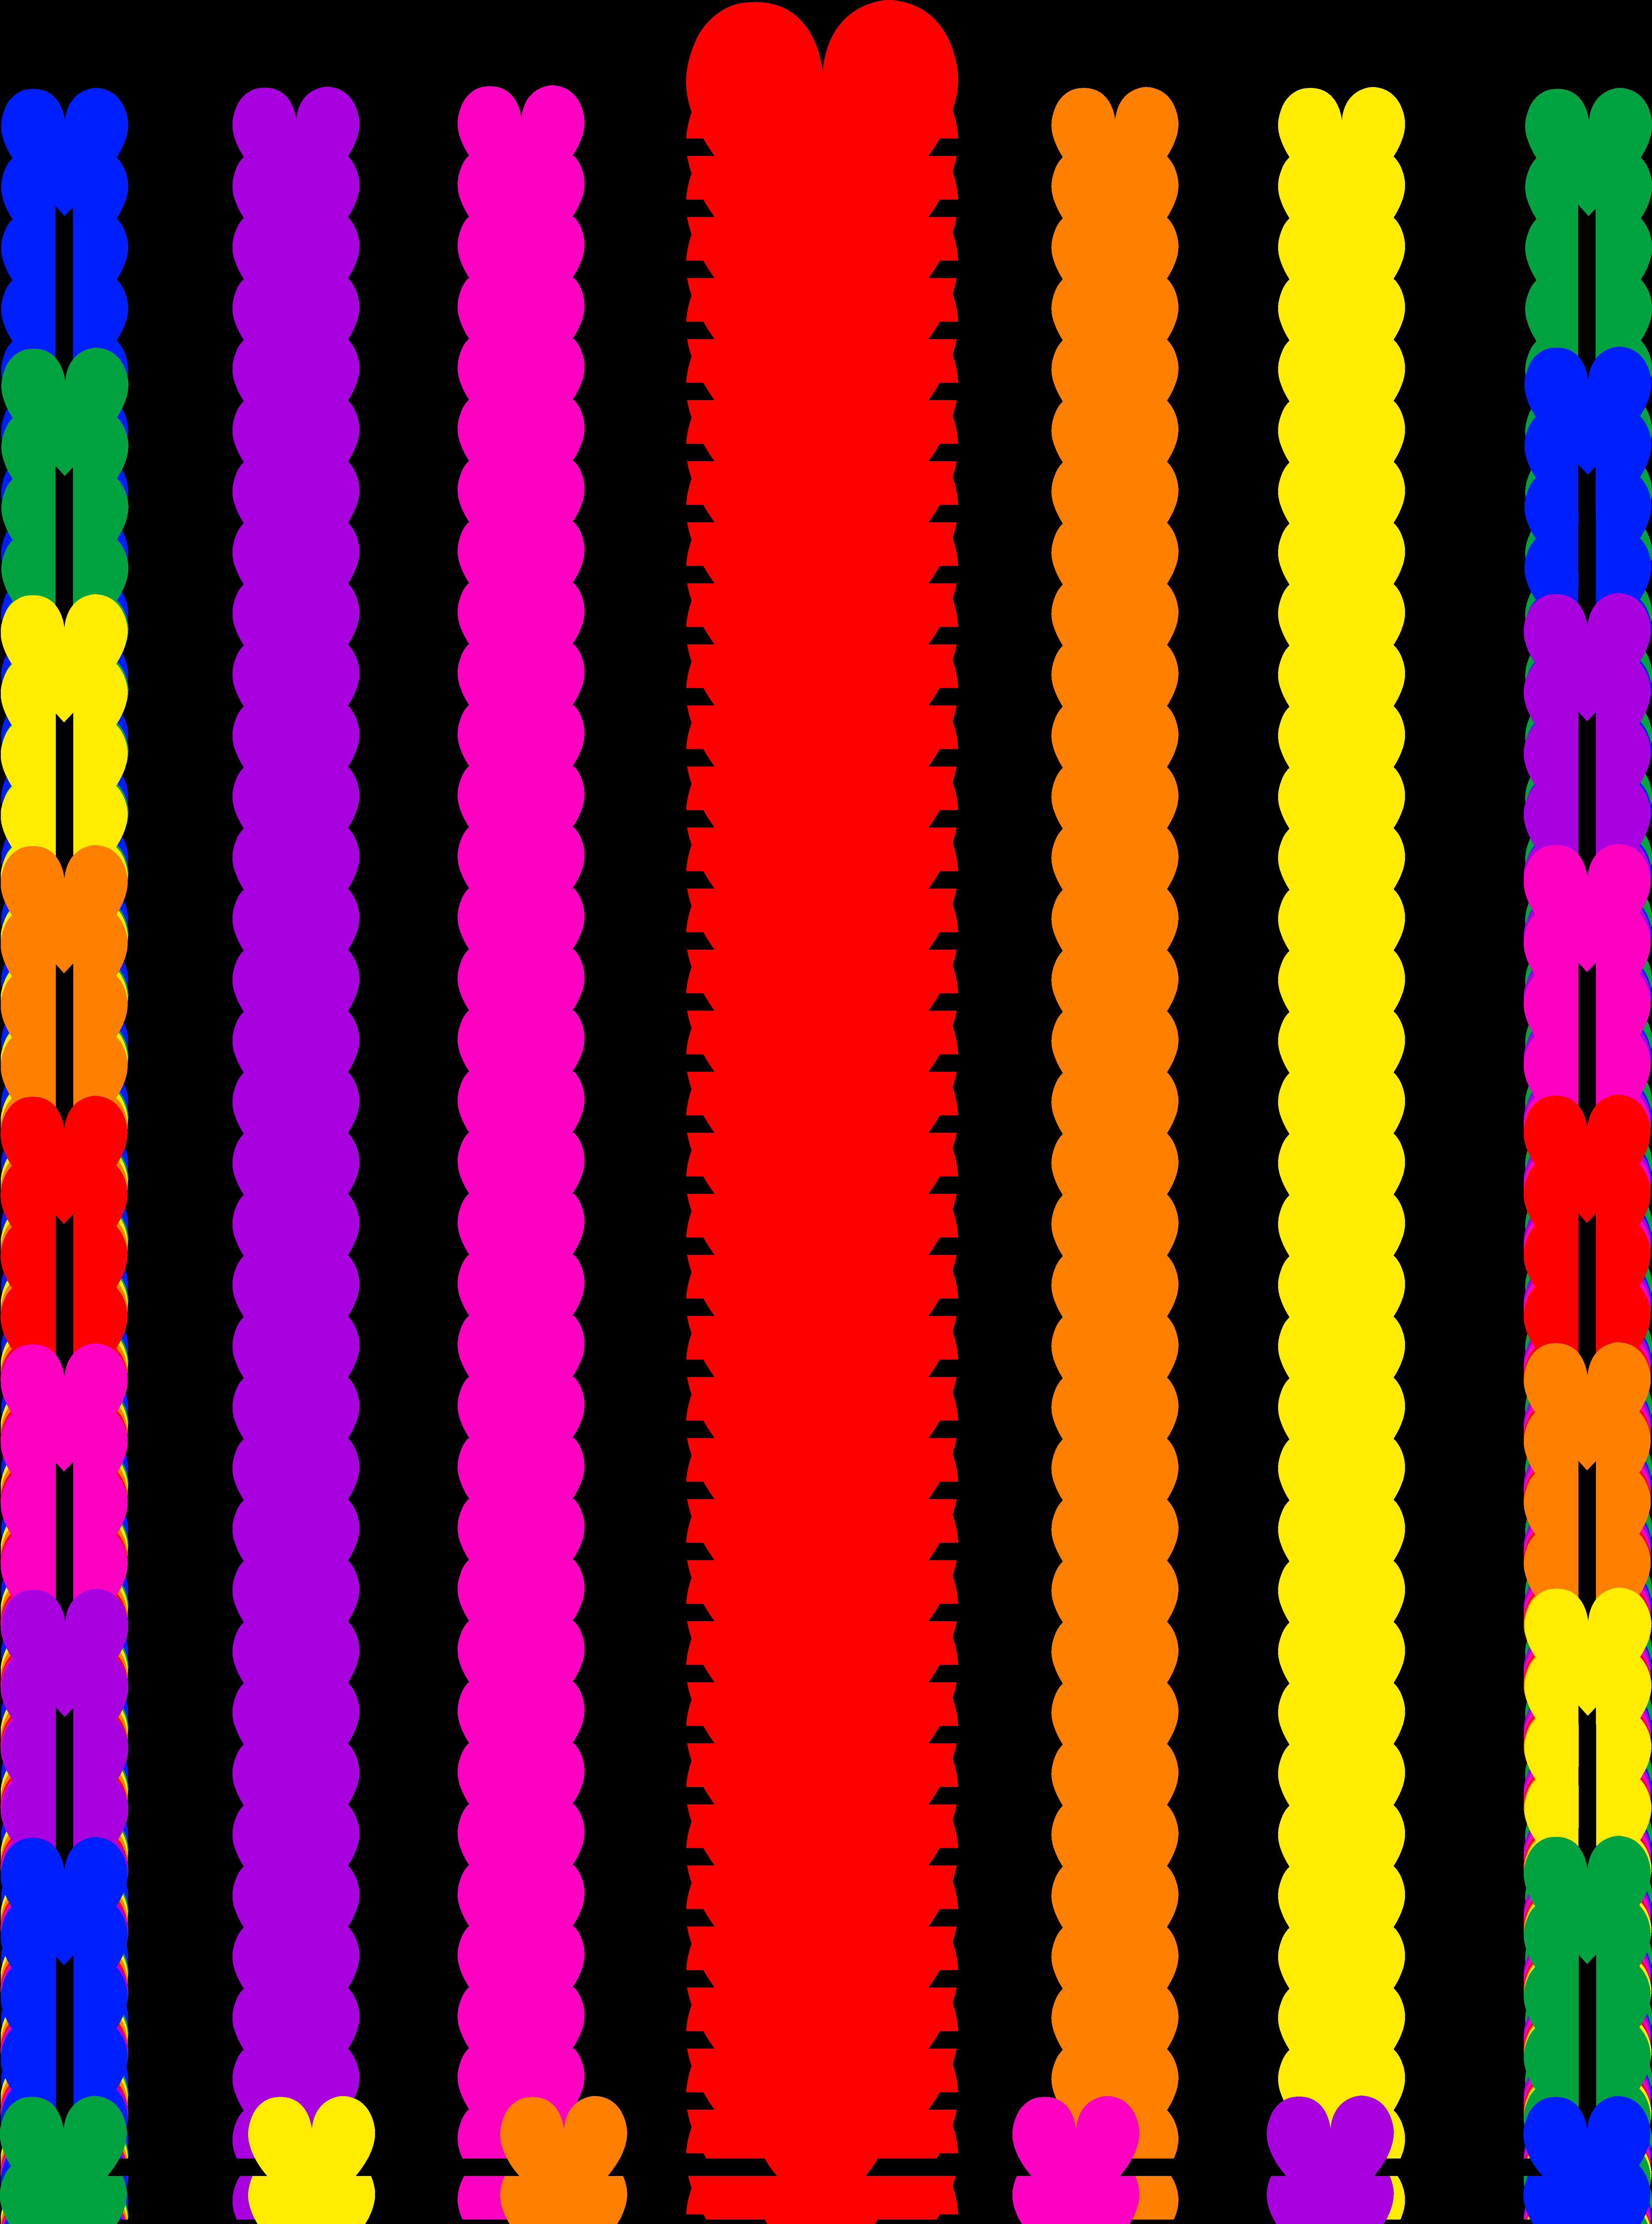 borders and frames clip art | Rainbow Hearts Border Frame - Free Clip Art - Heart Border PNG HD